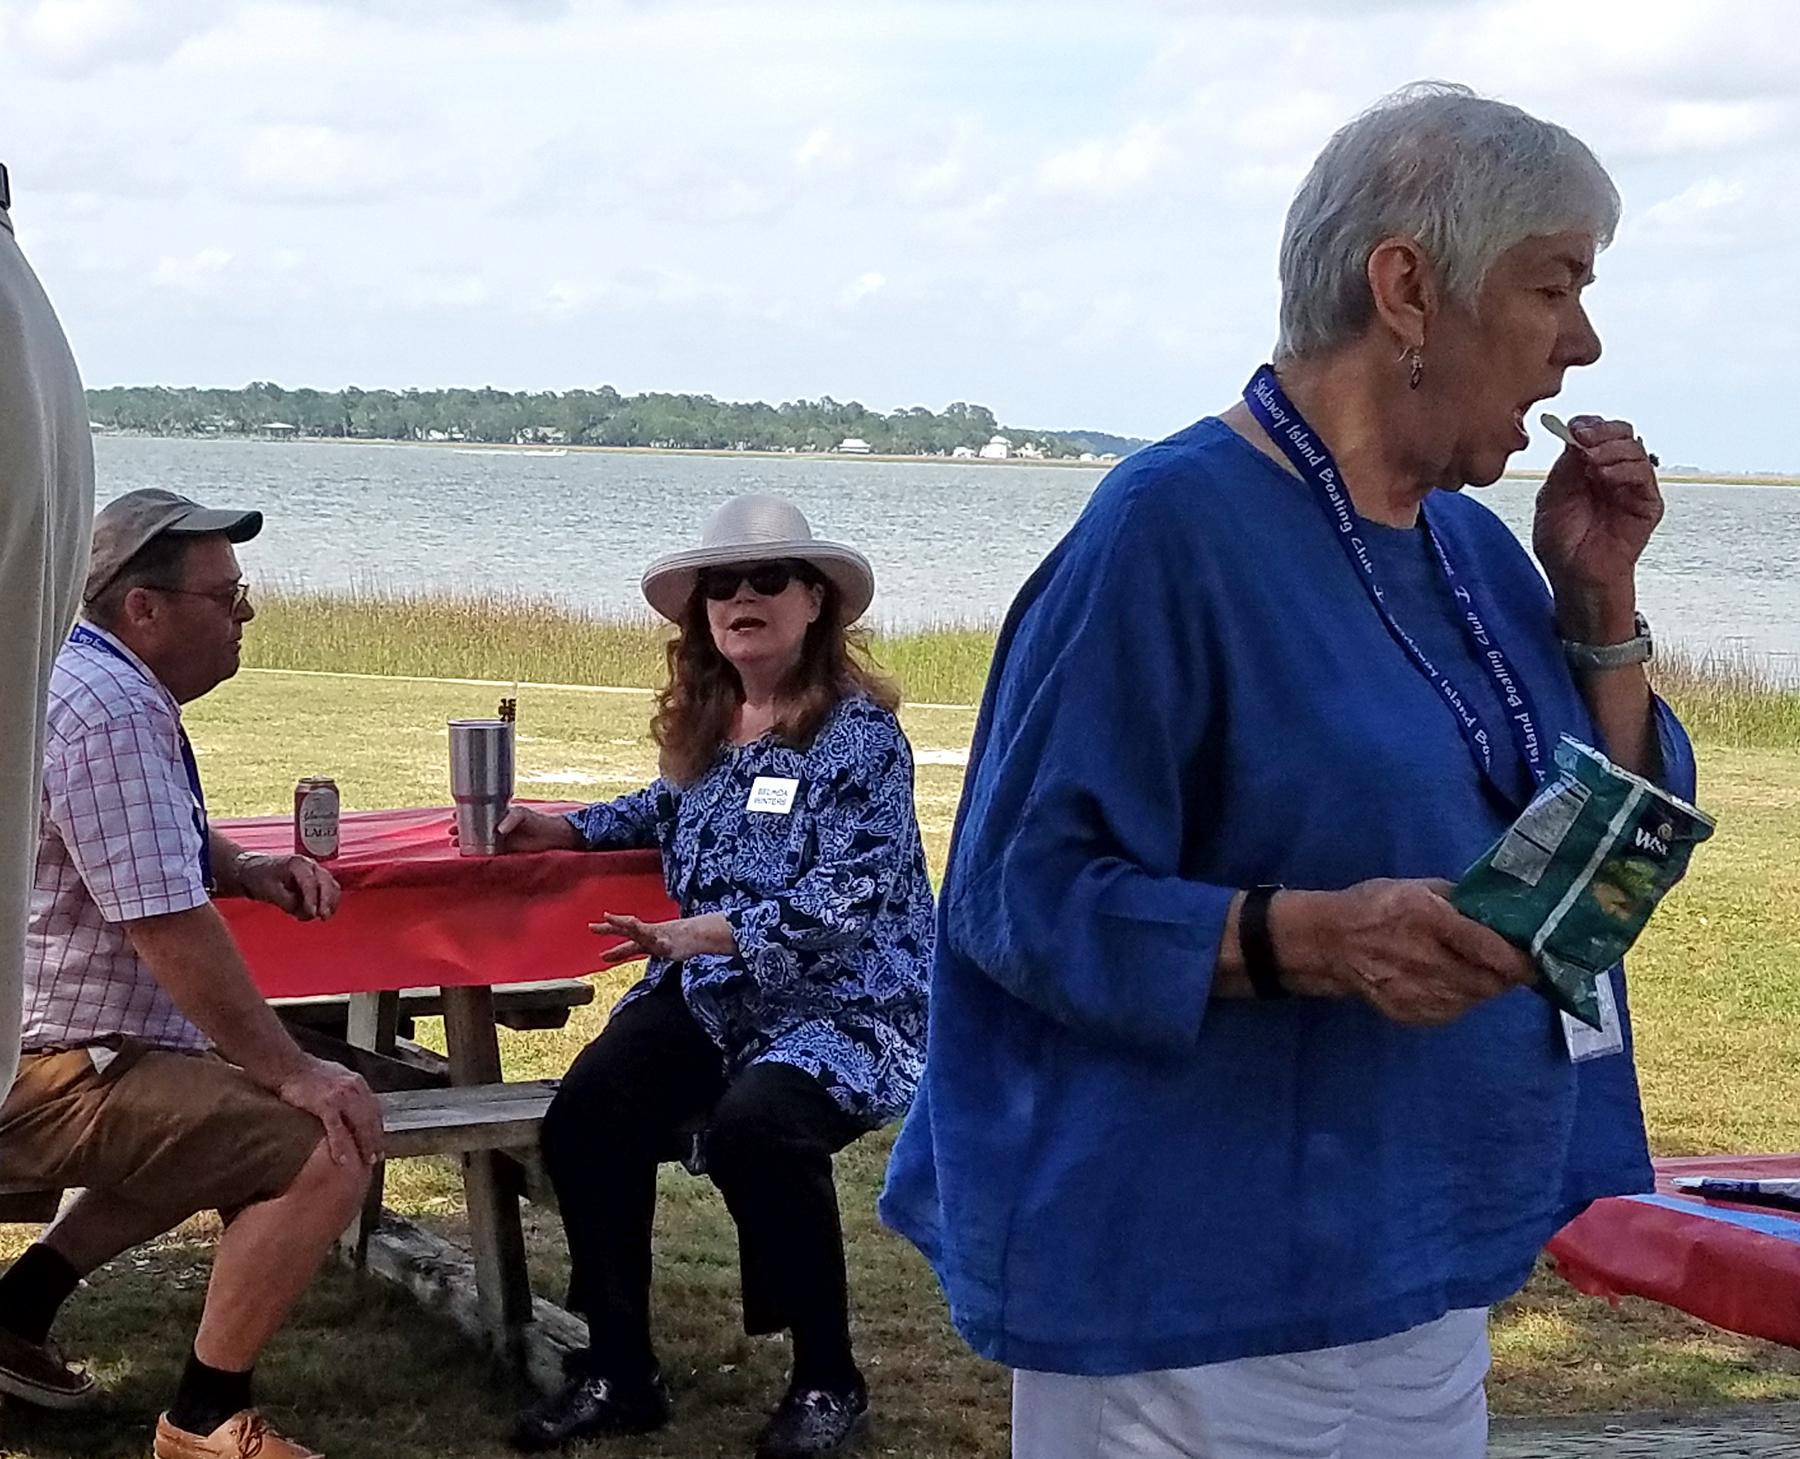 SIBC Games Day, May 18, 2017, Members eat and play at Landings Harbor